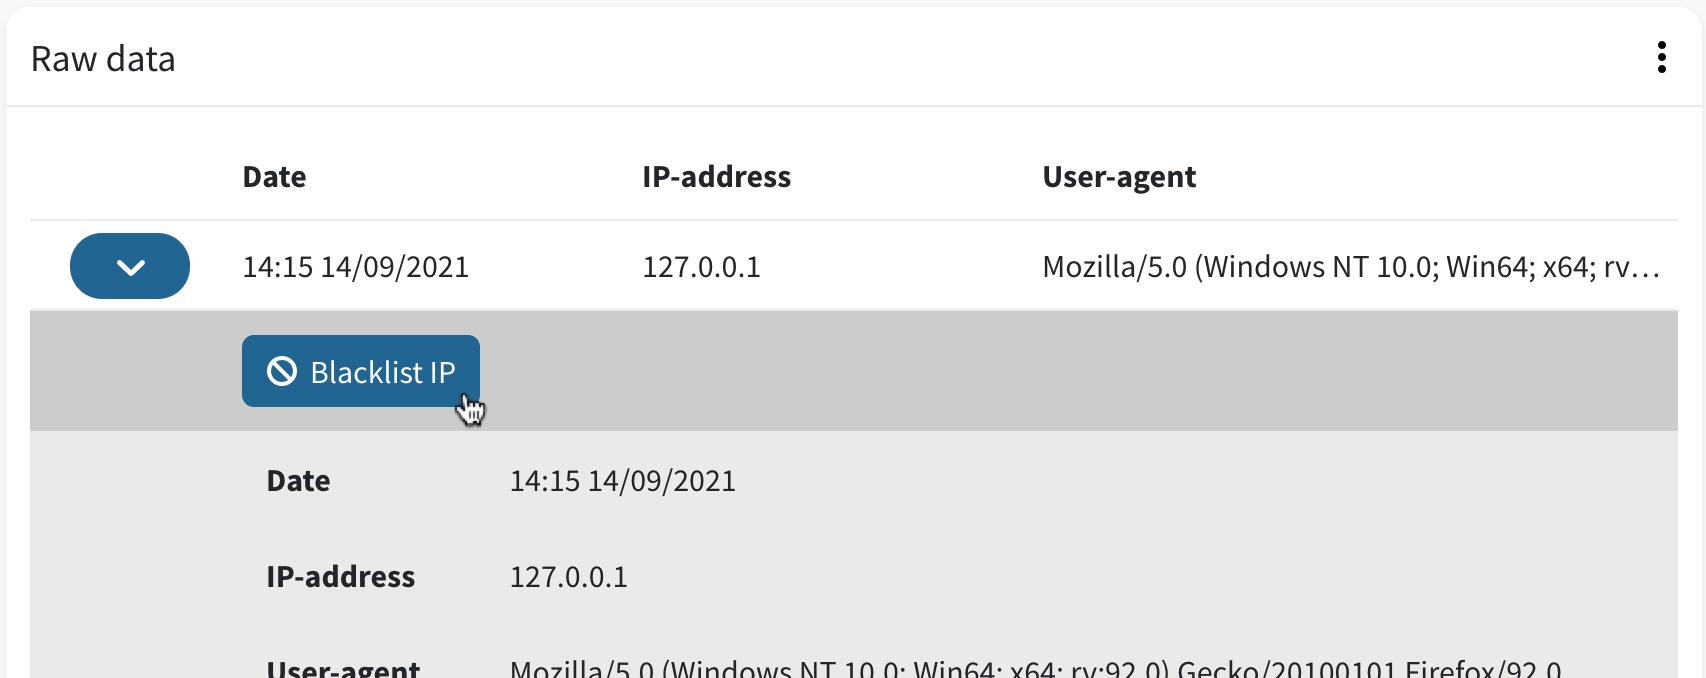 Blacklist IP-address from raw data